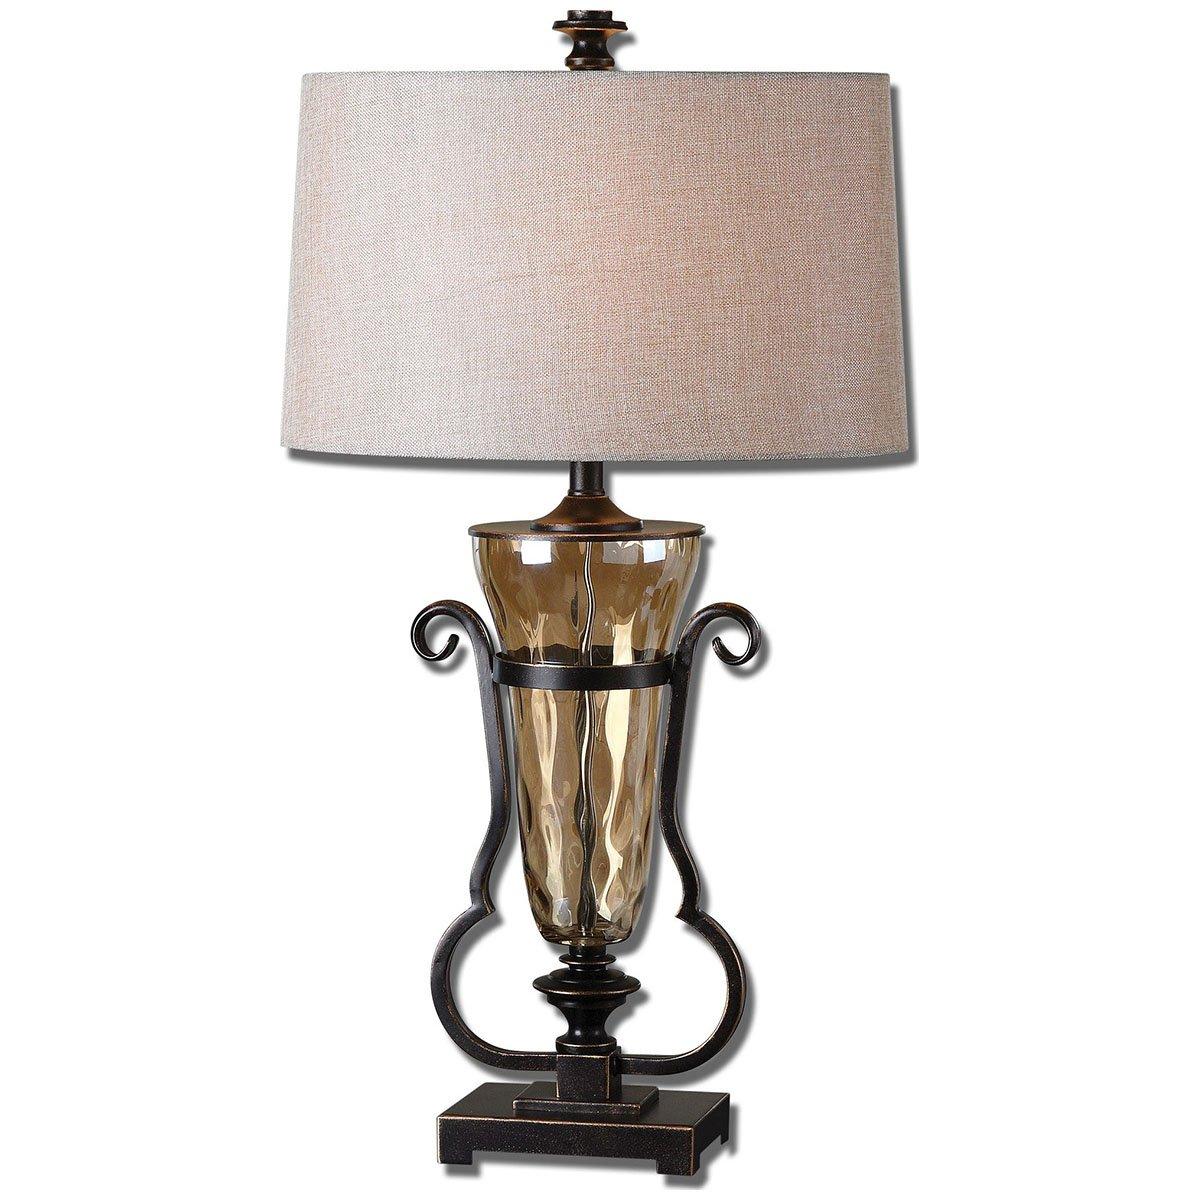 Amazon.com: Uttermost 26594 Aemiliana Glass Table Lamp, Amber: Home U0026  Kitchen